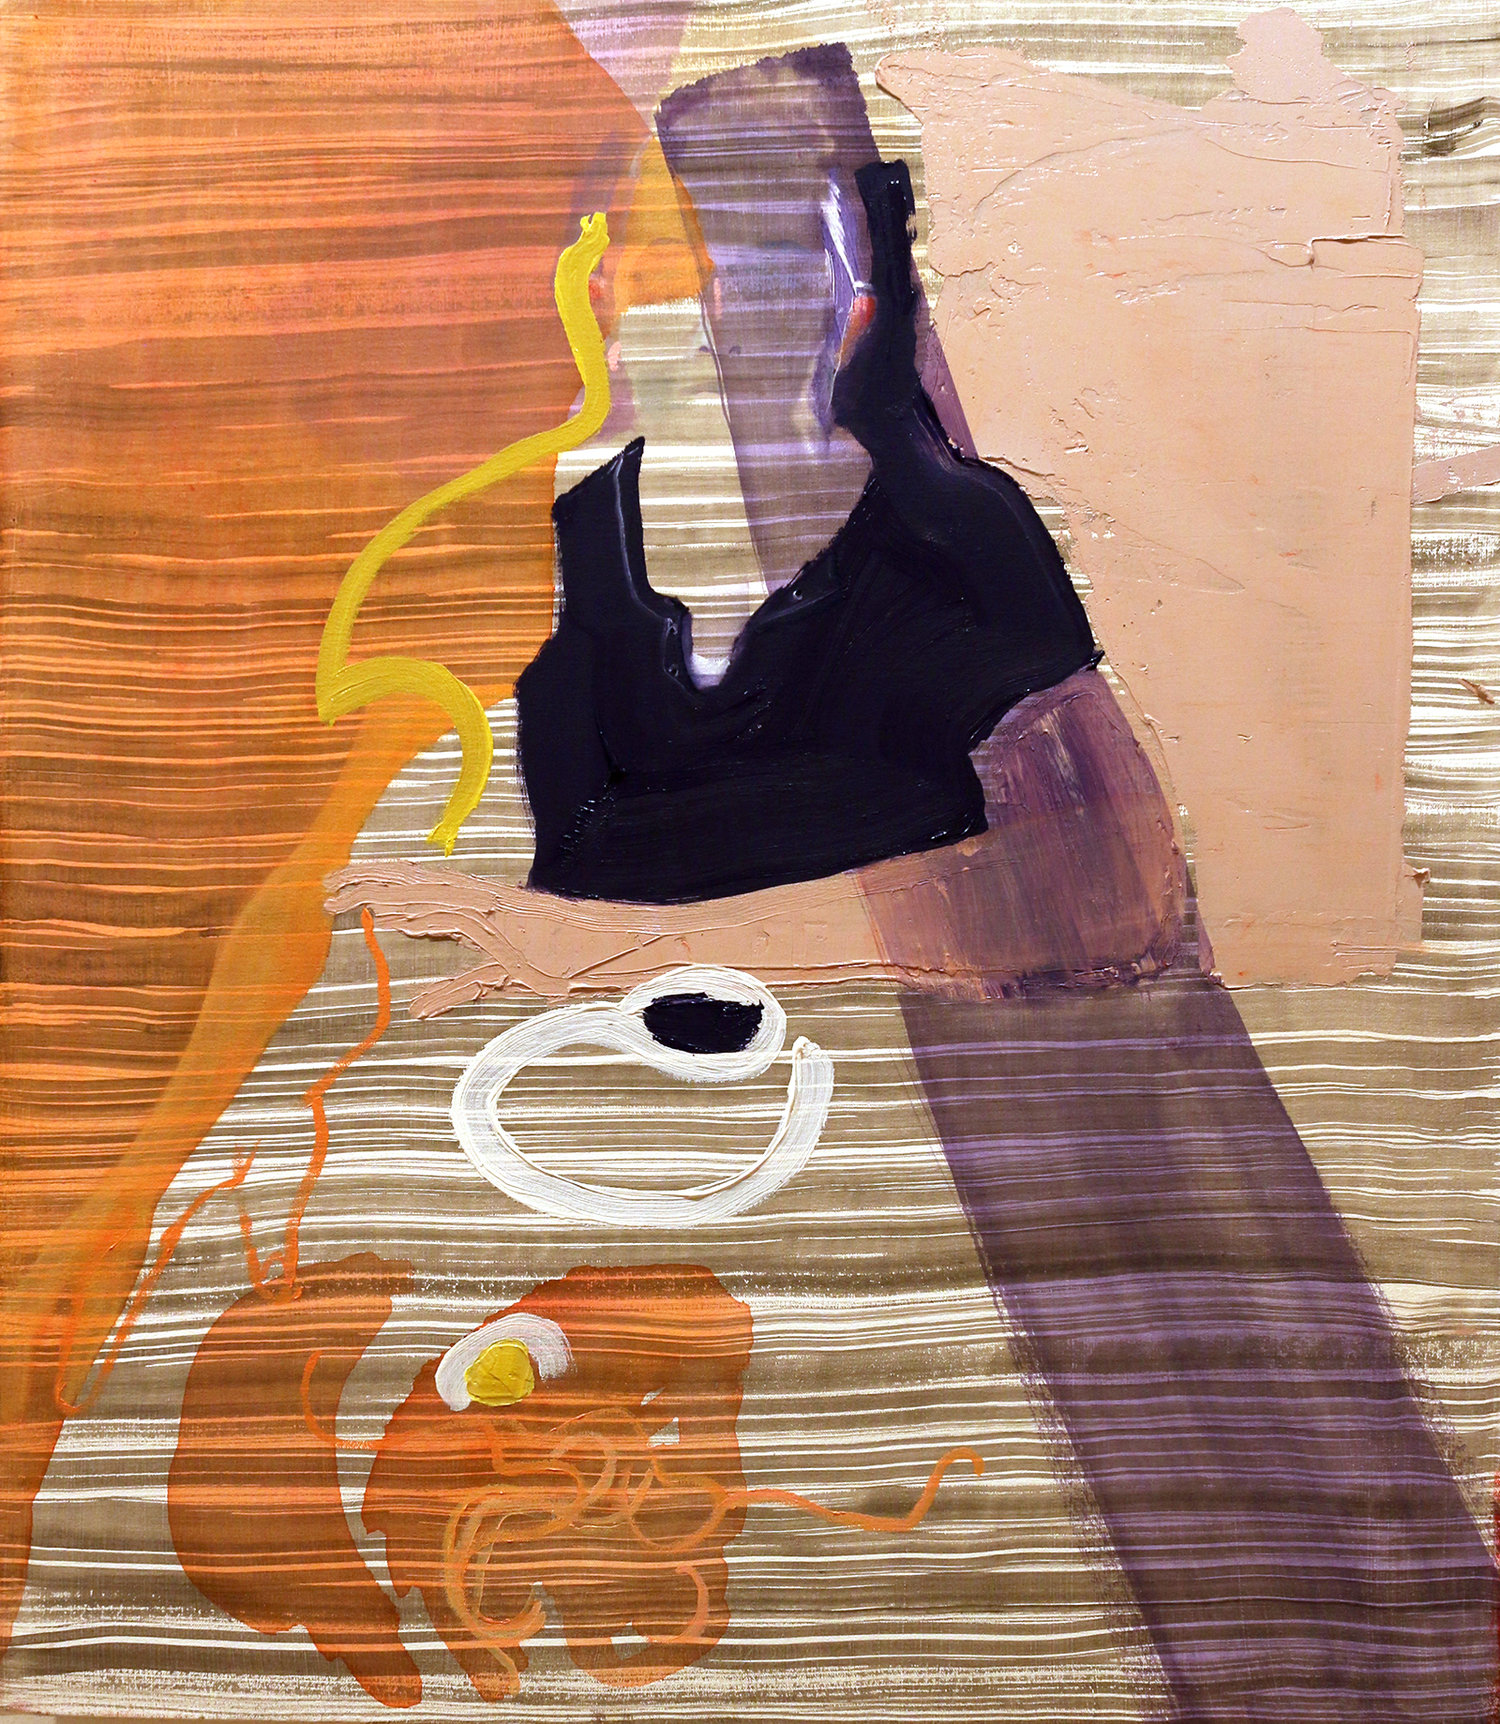 Tea and Ramen, art by Gina Malek